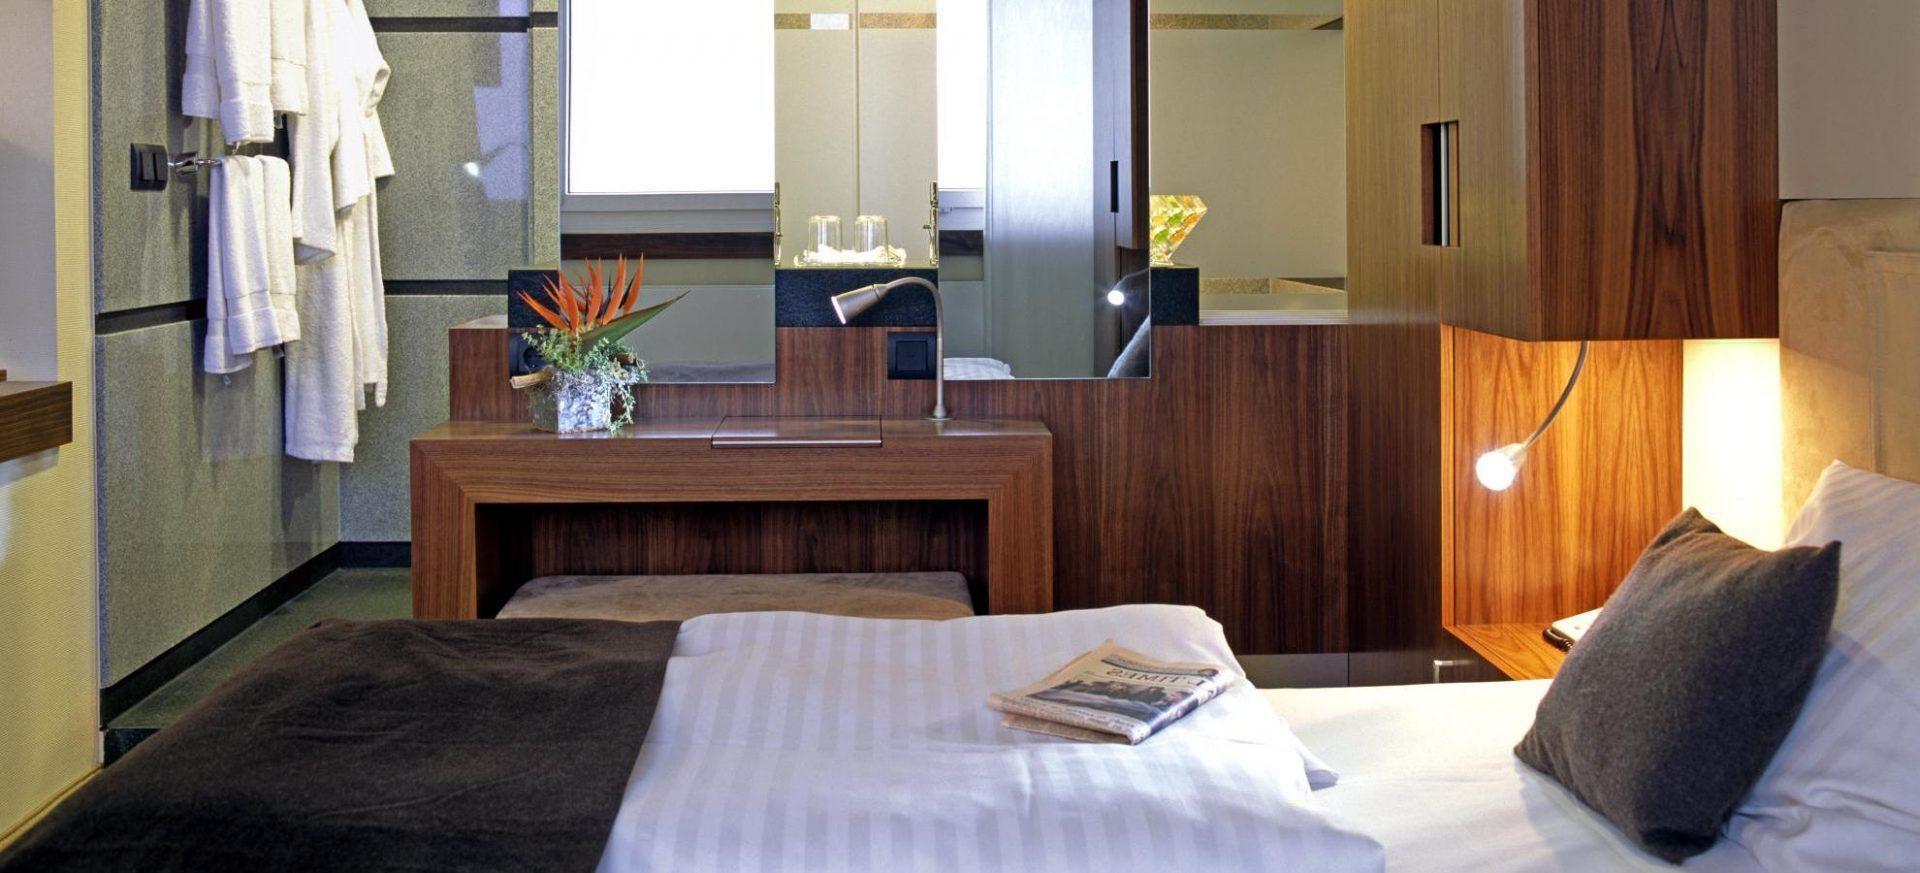 Erfurt Hotel